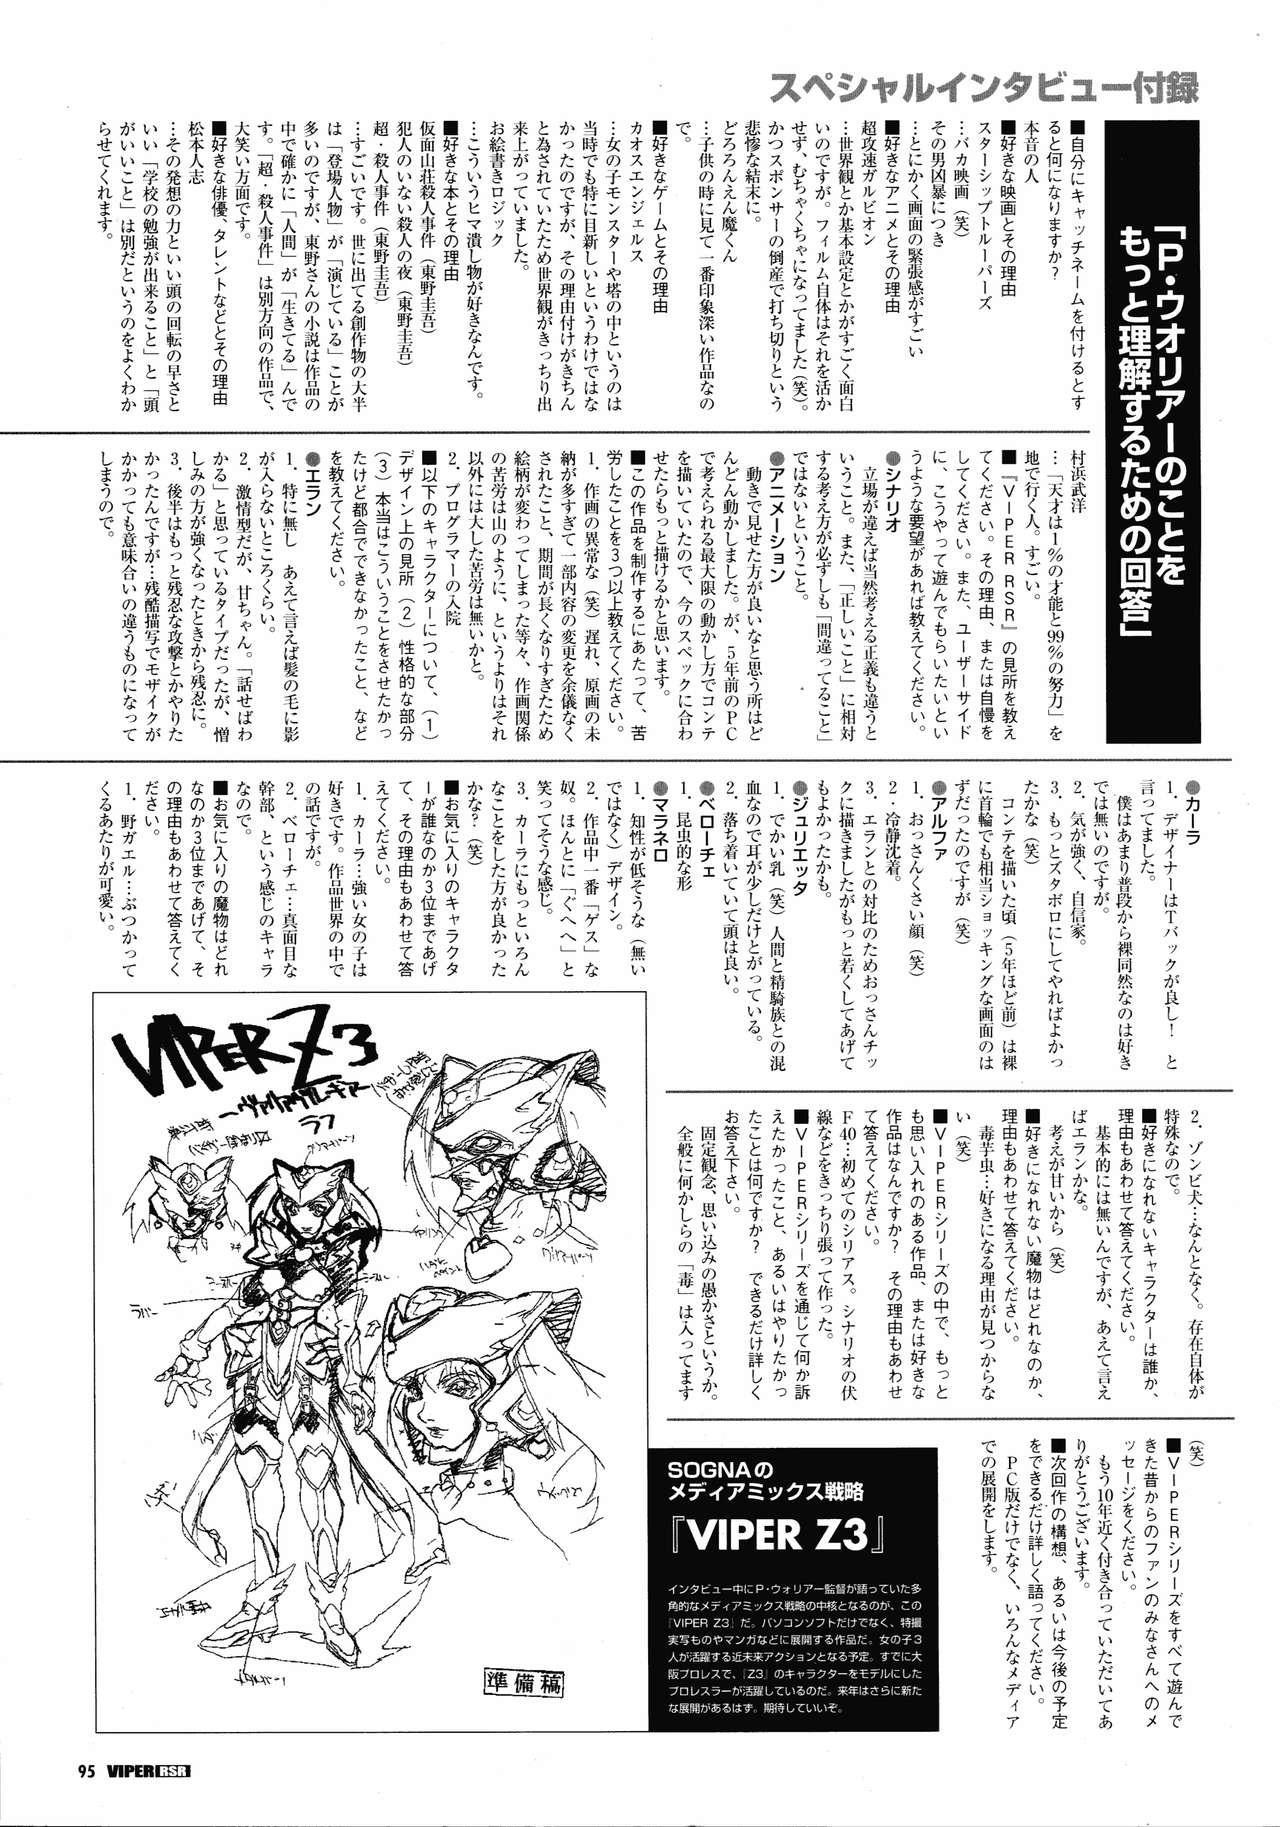 Viper Official Art Book 96